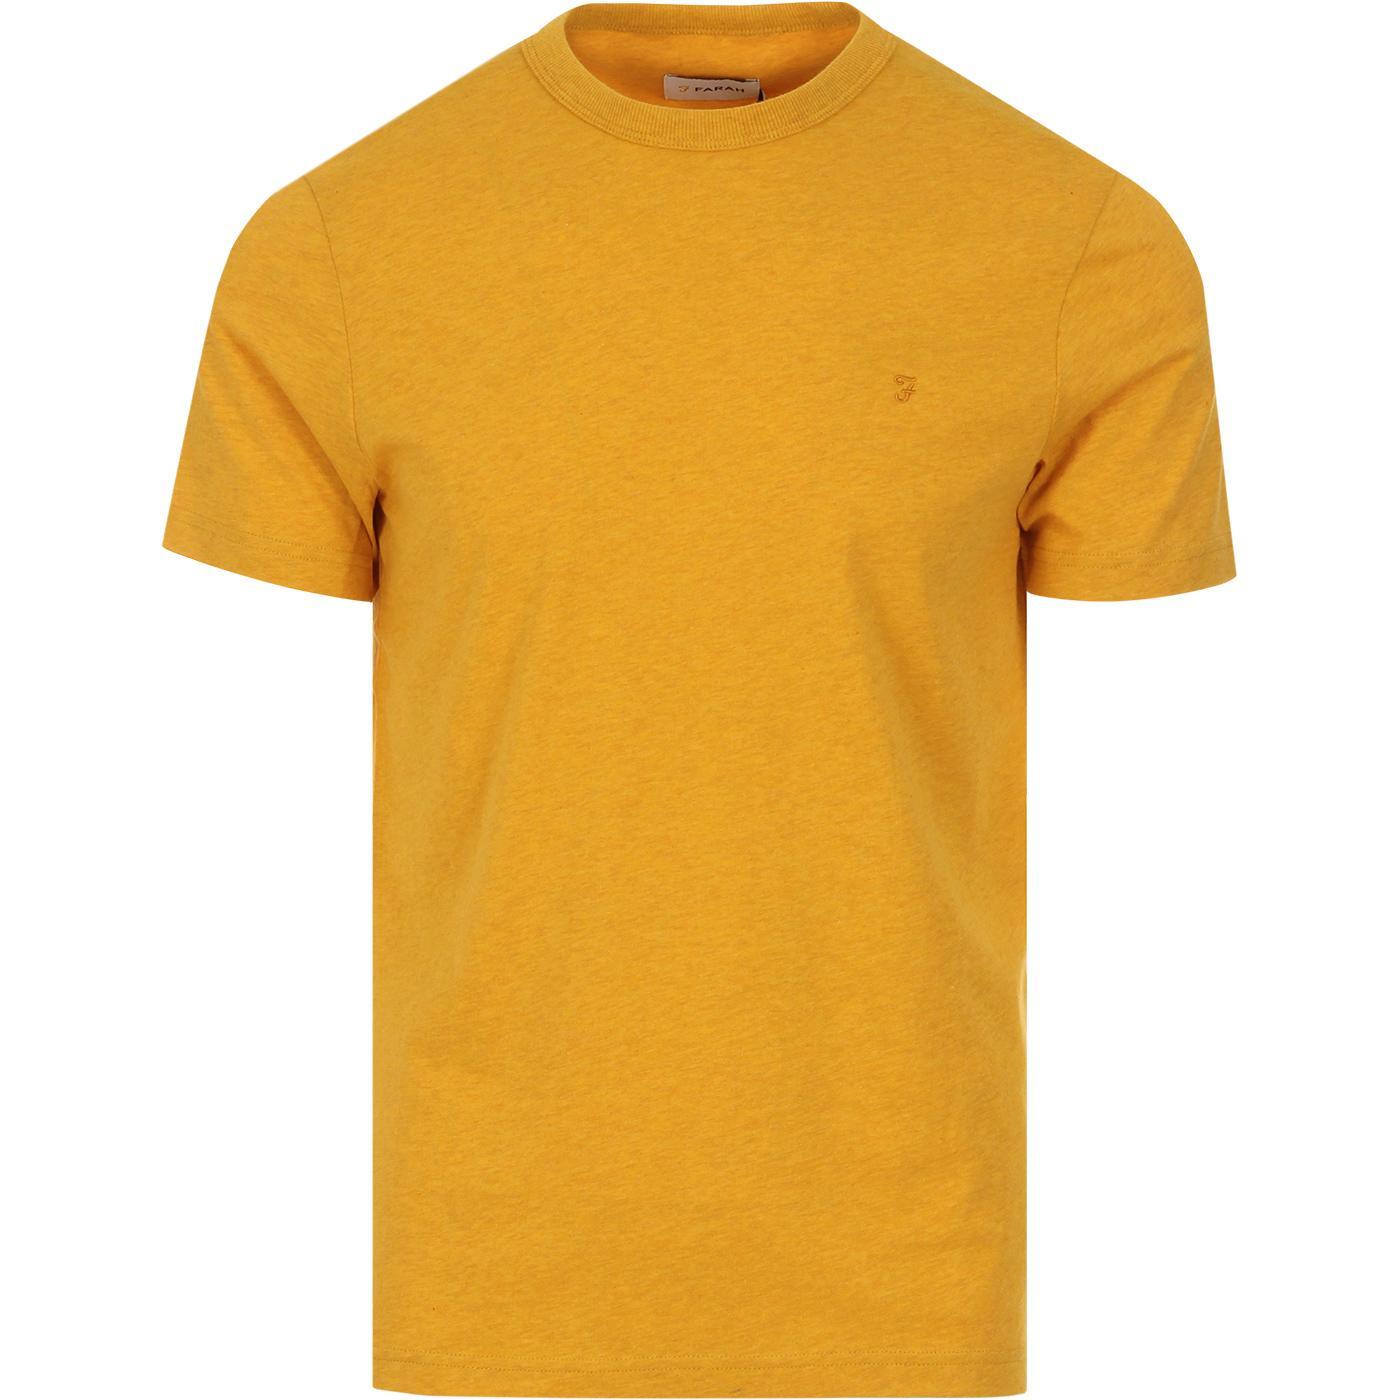 Danny FARAH Retro Marl Crew Neck Tee (Mustard)